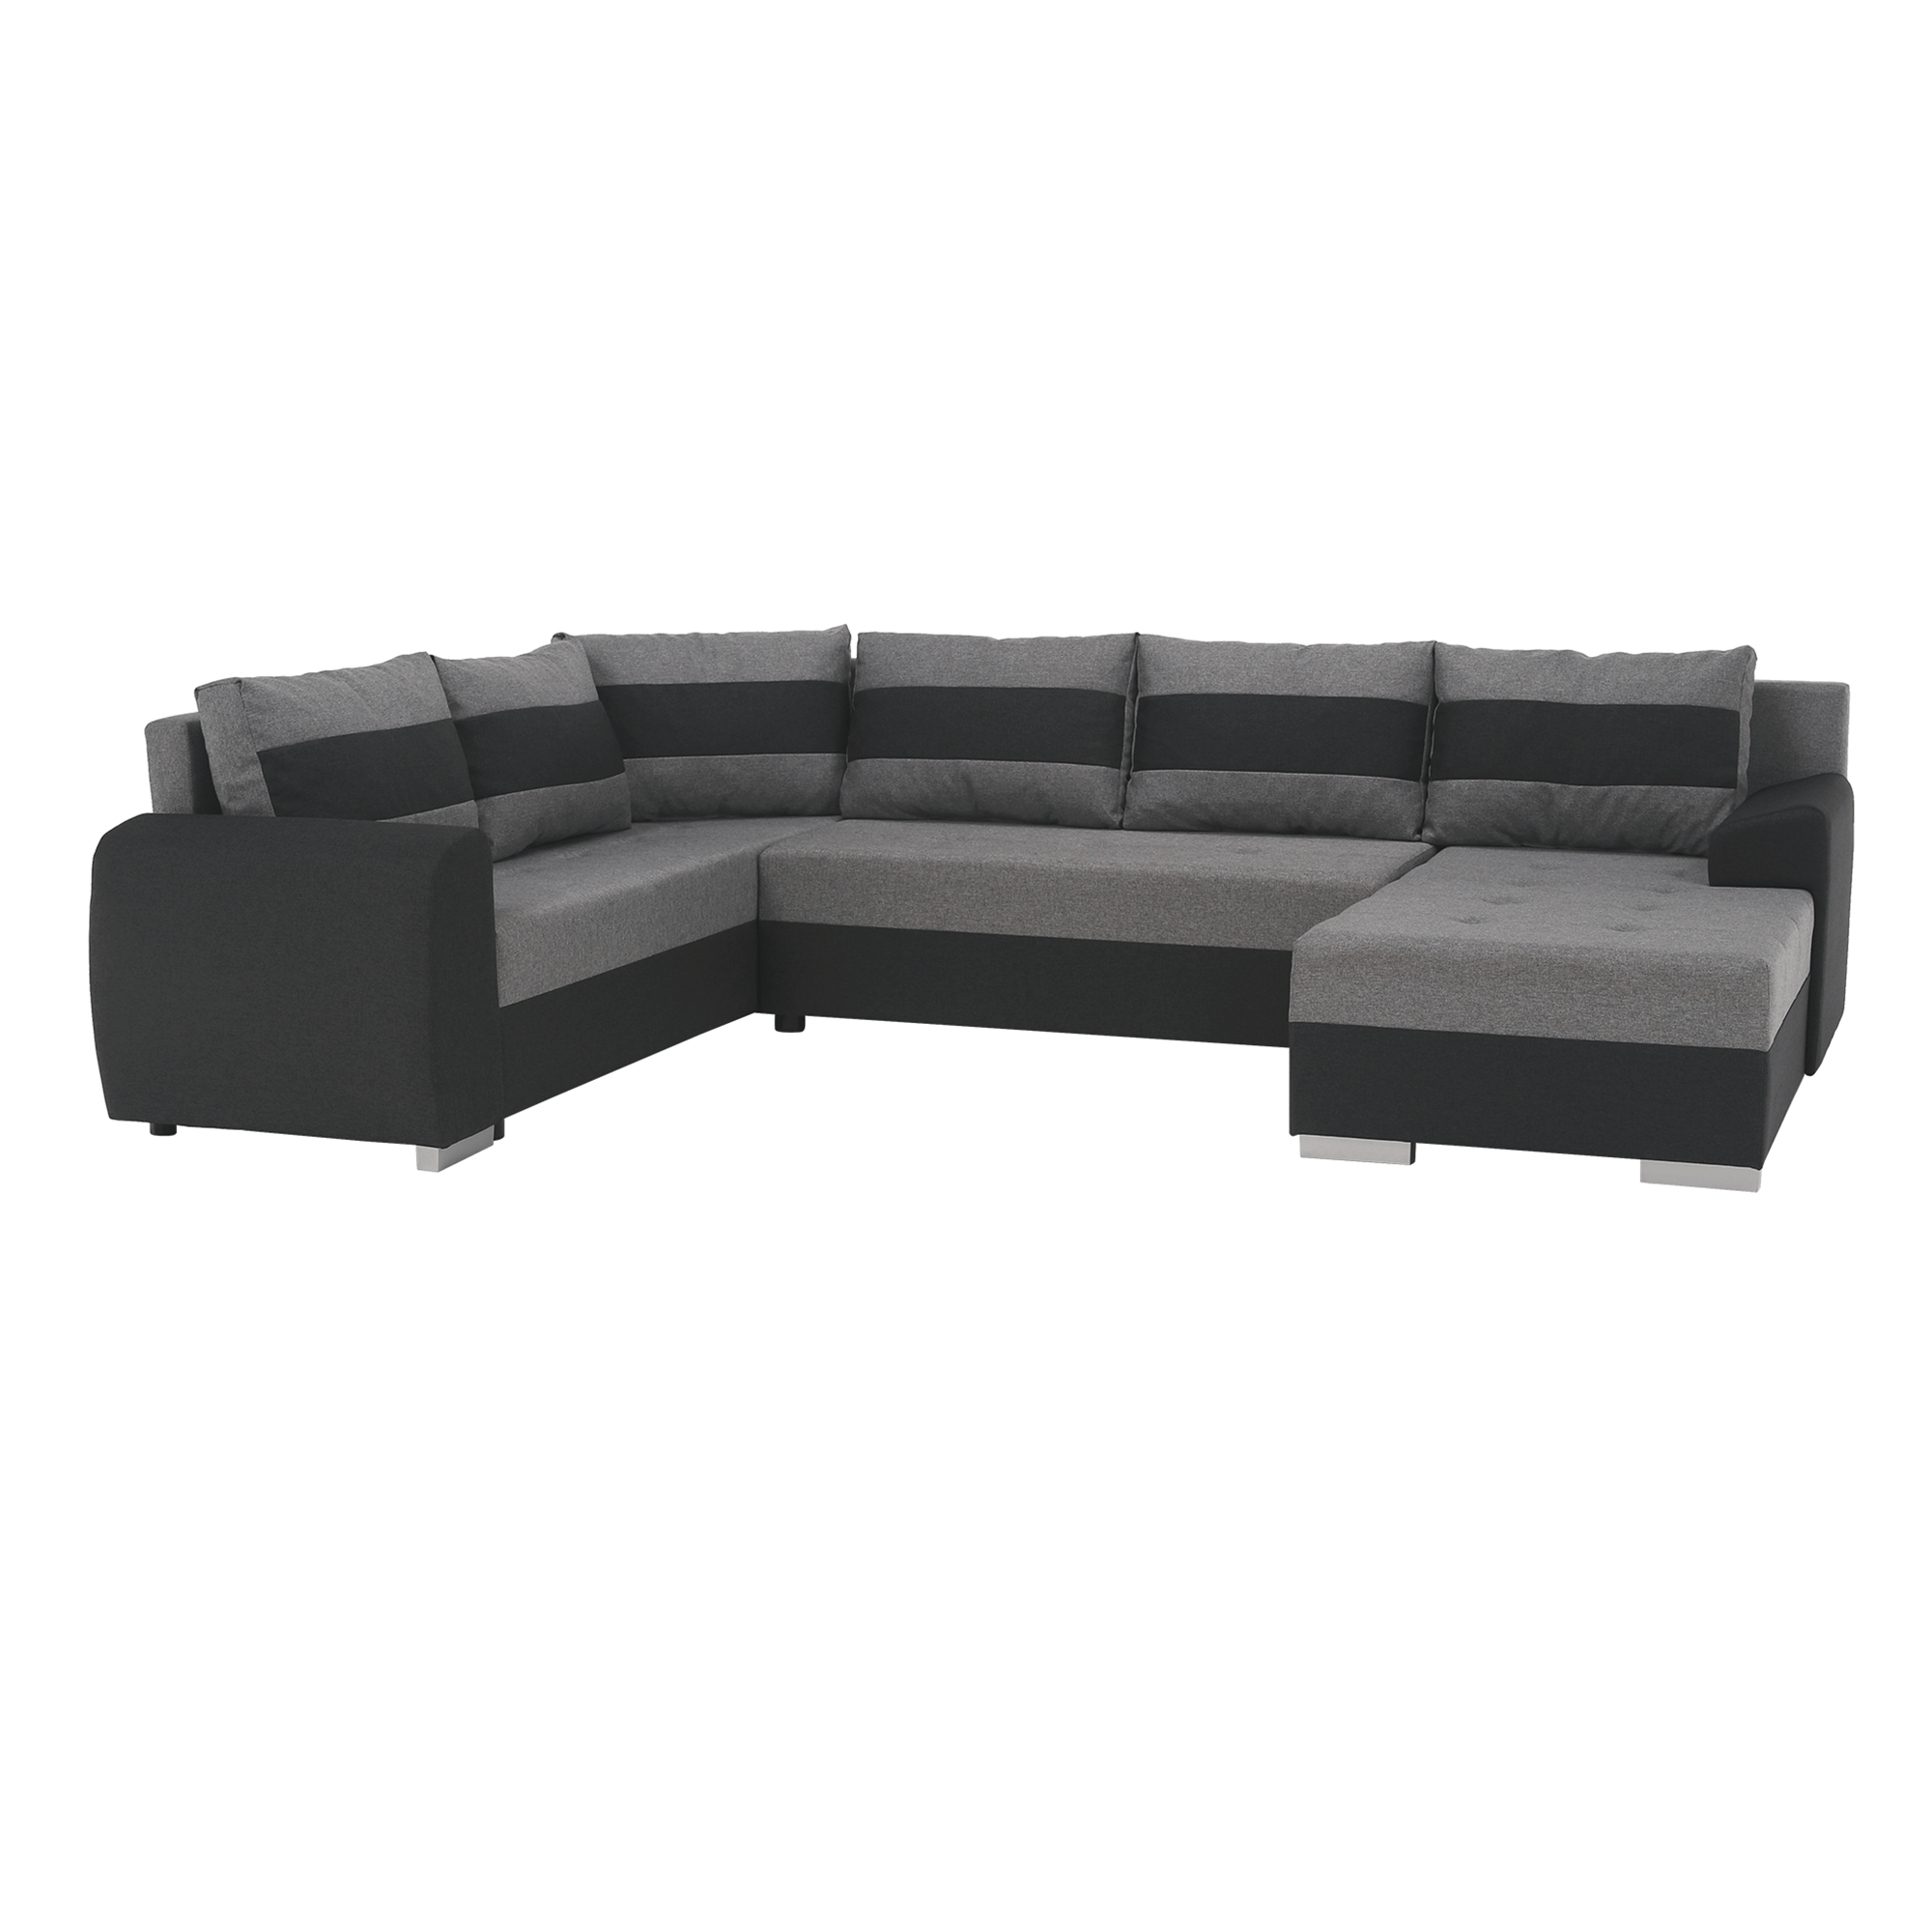 Canapea universală, gri închis / gri, BONN